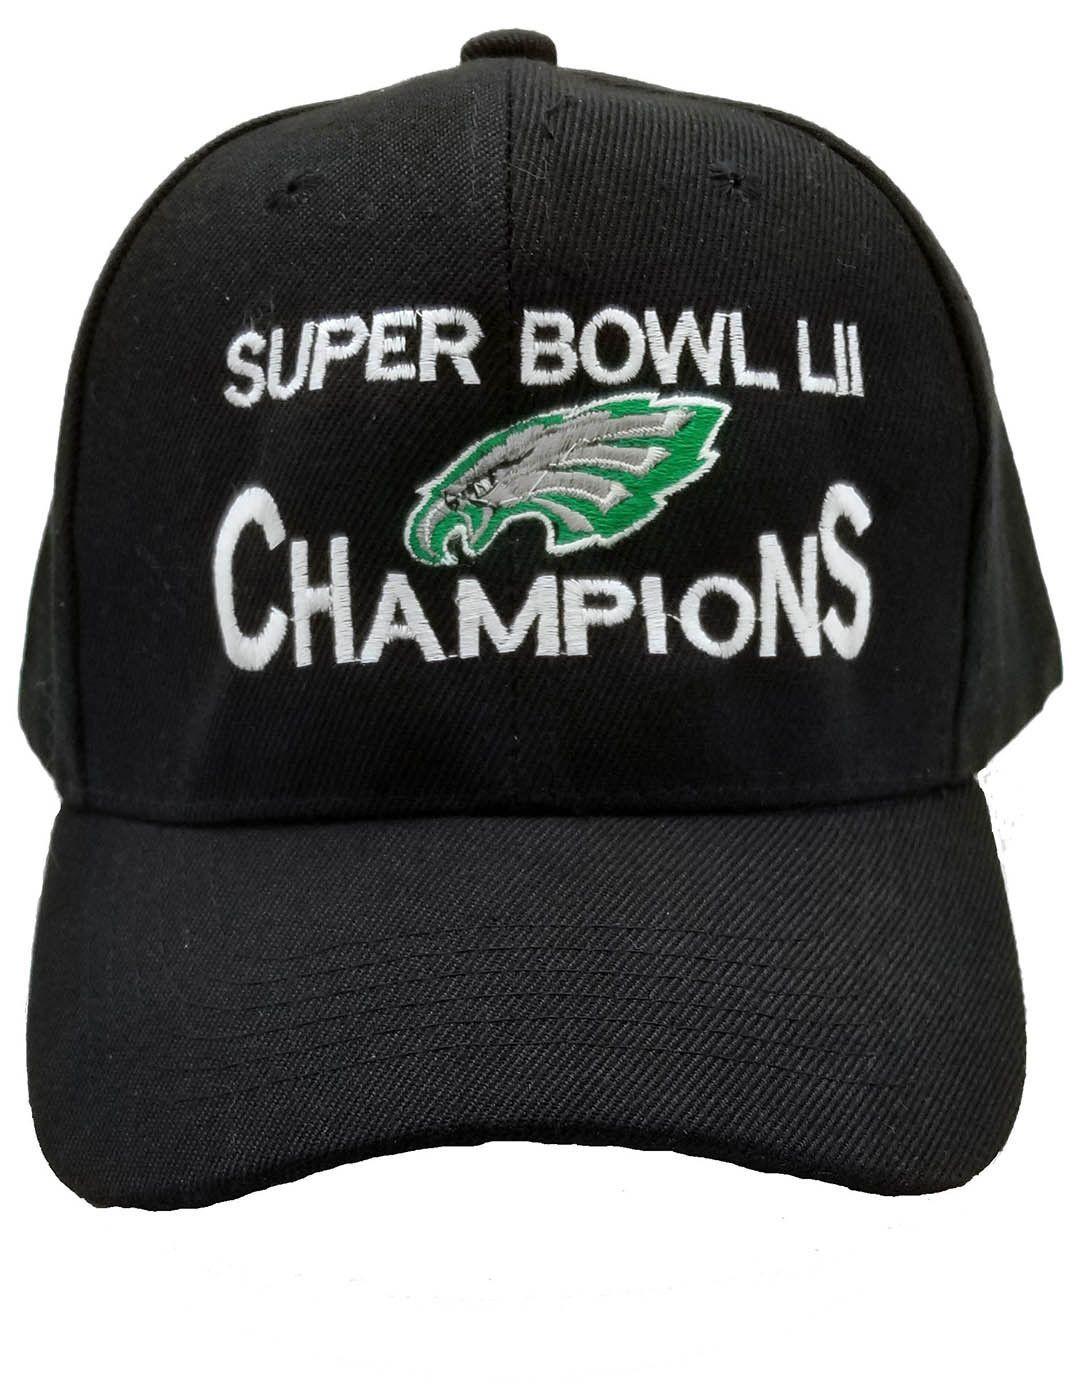 Valentines Gift Philadelphia Eagles Super Bowl Lii 52 Champions Cap Hat  Adjust 6cfe27e5d